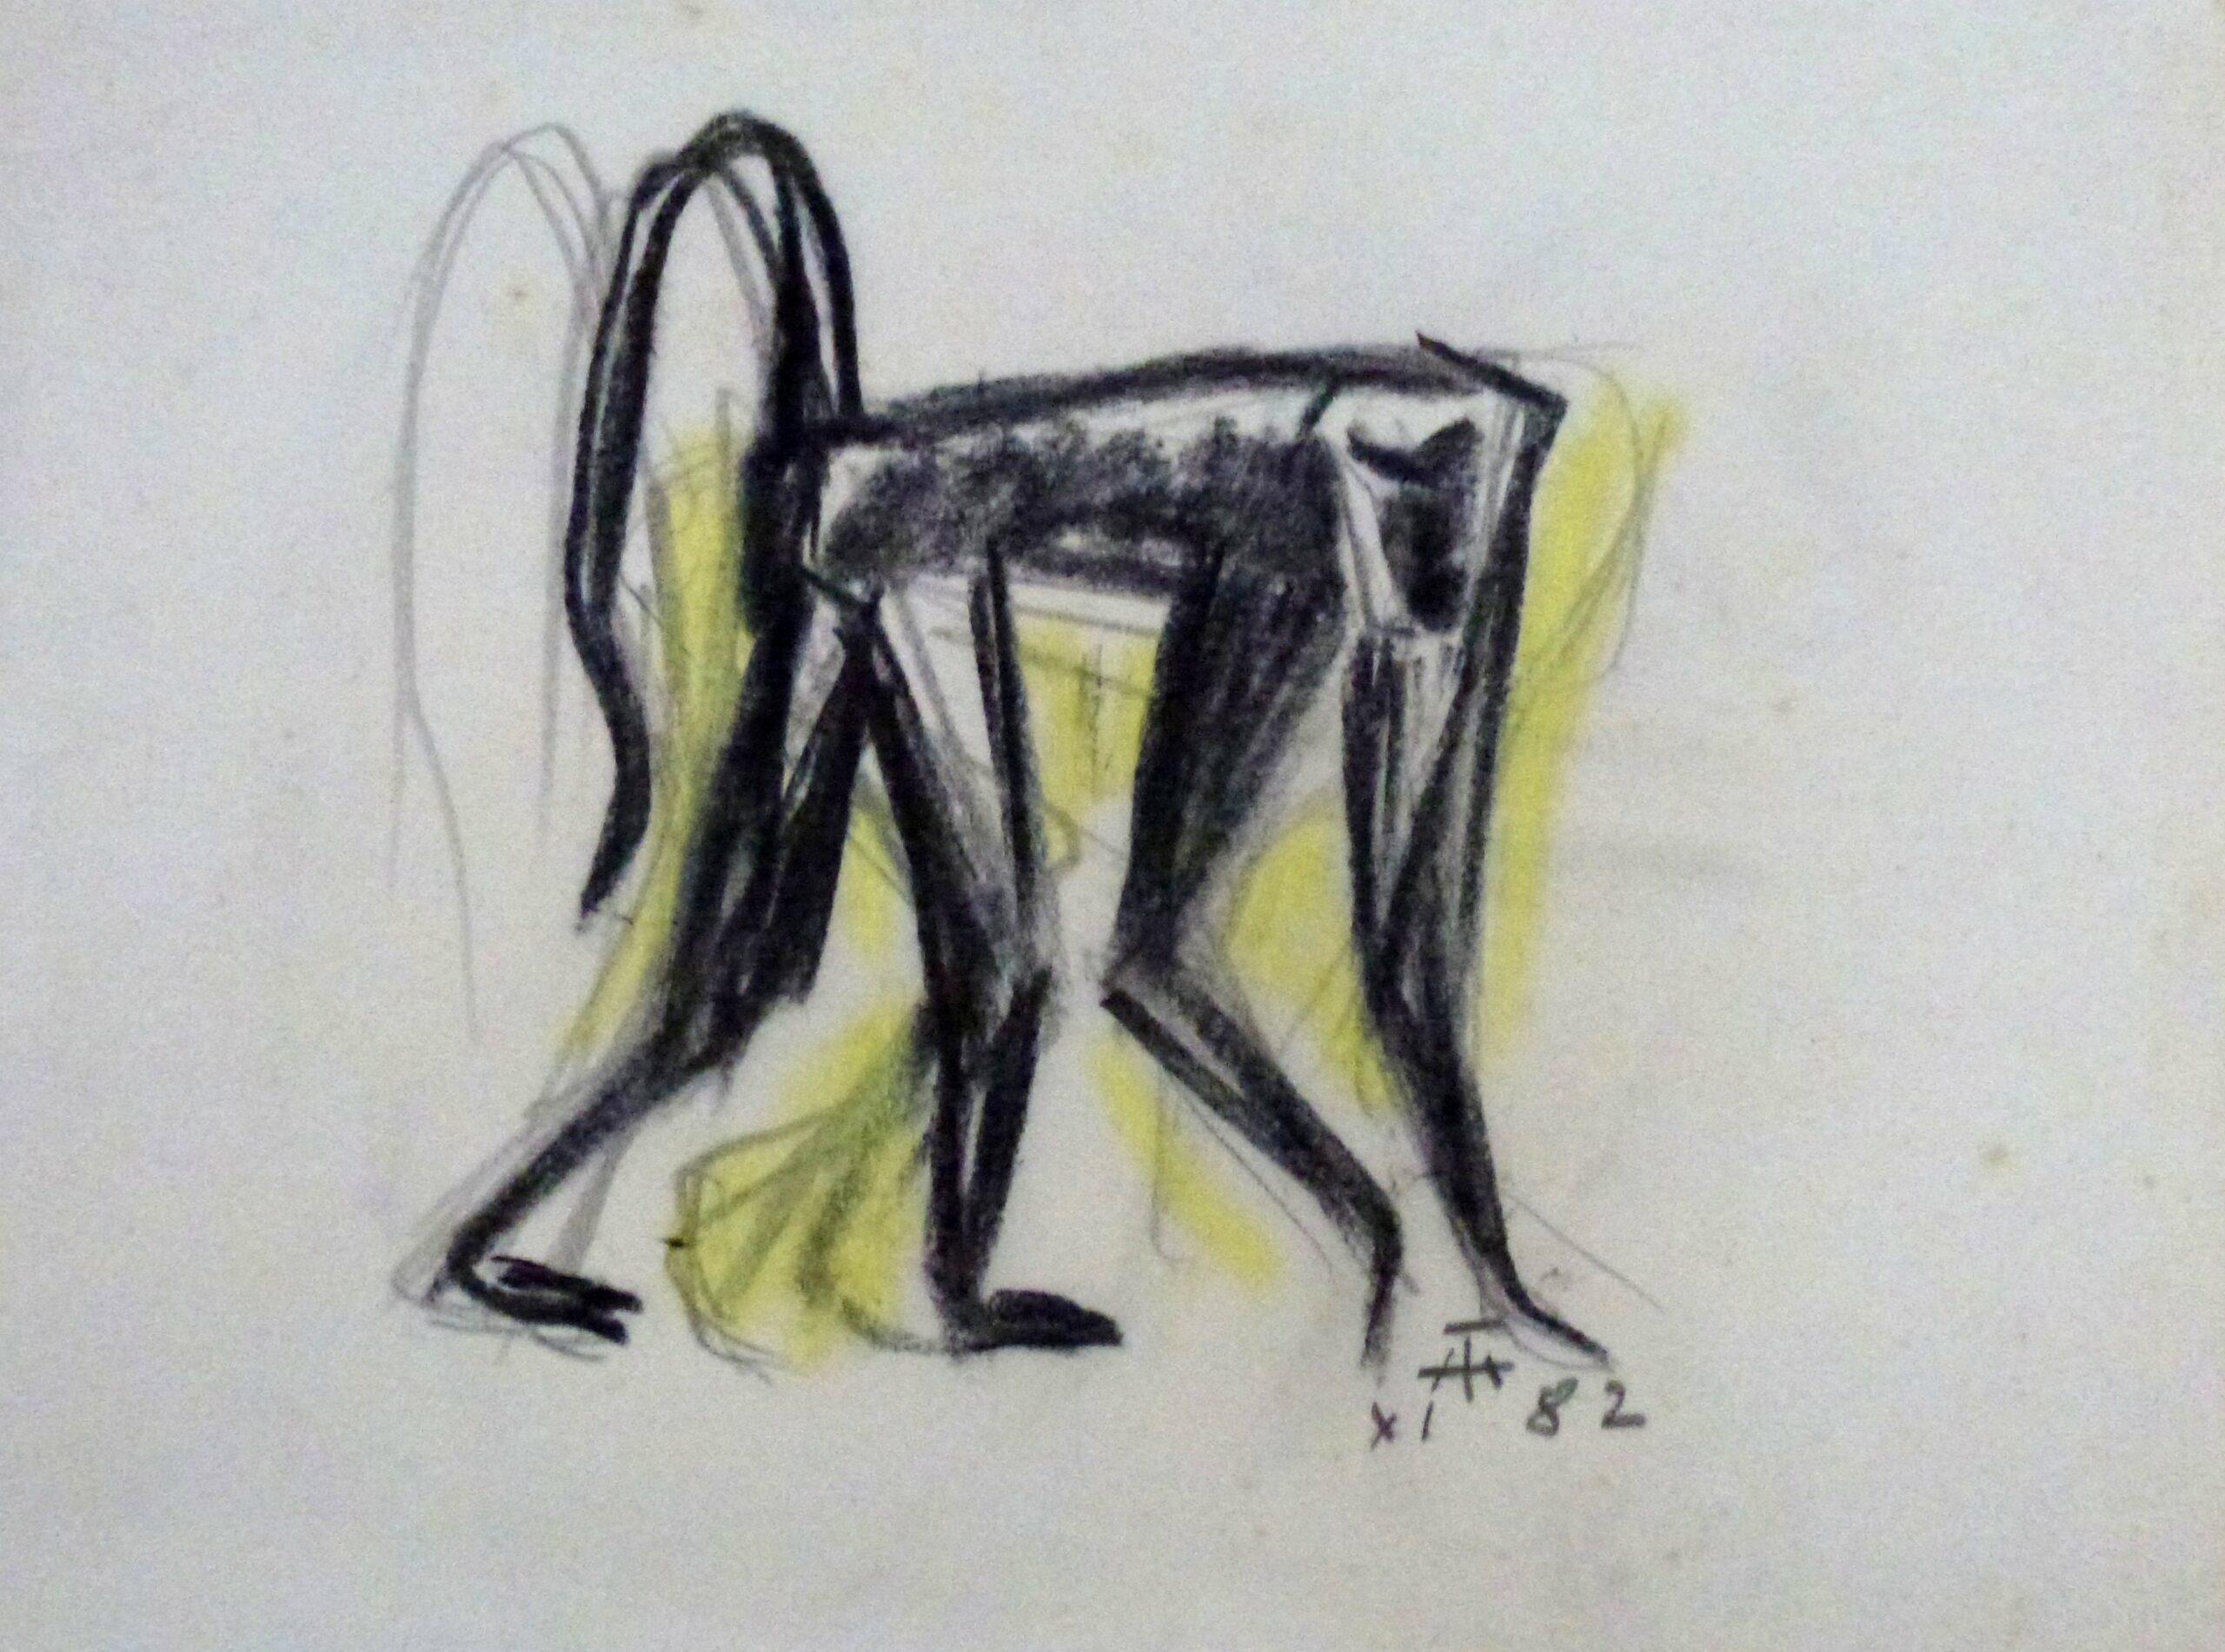 Chobe schreitender Affe – Oktober 1982